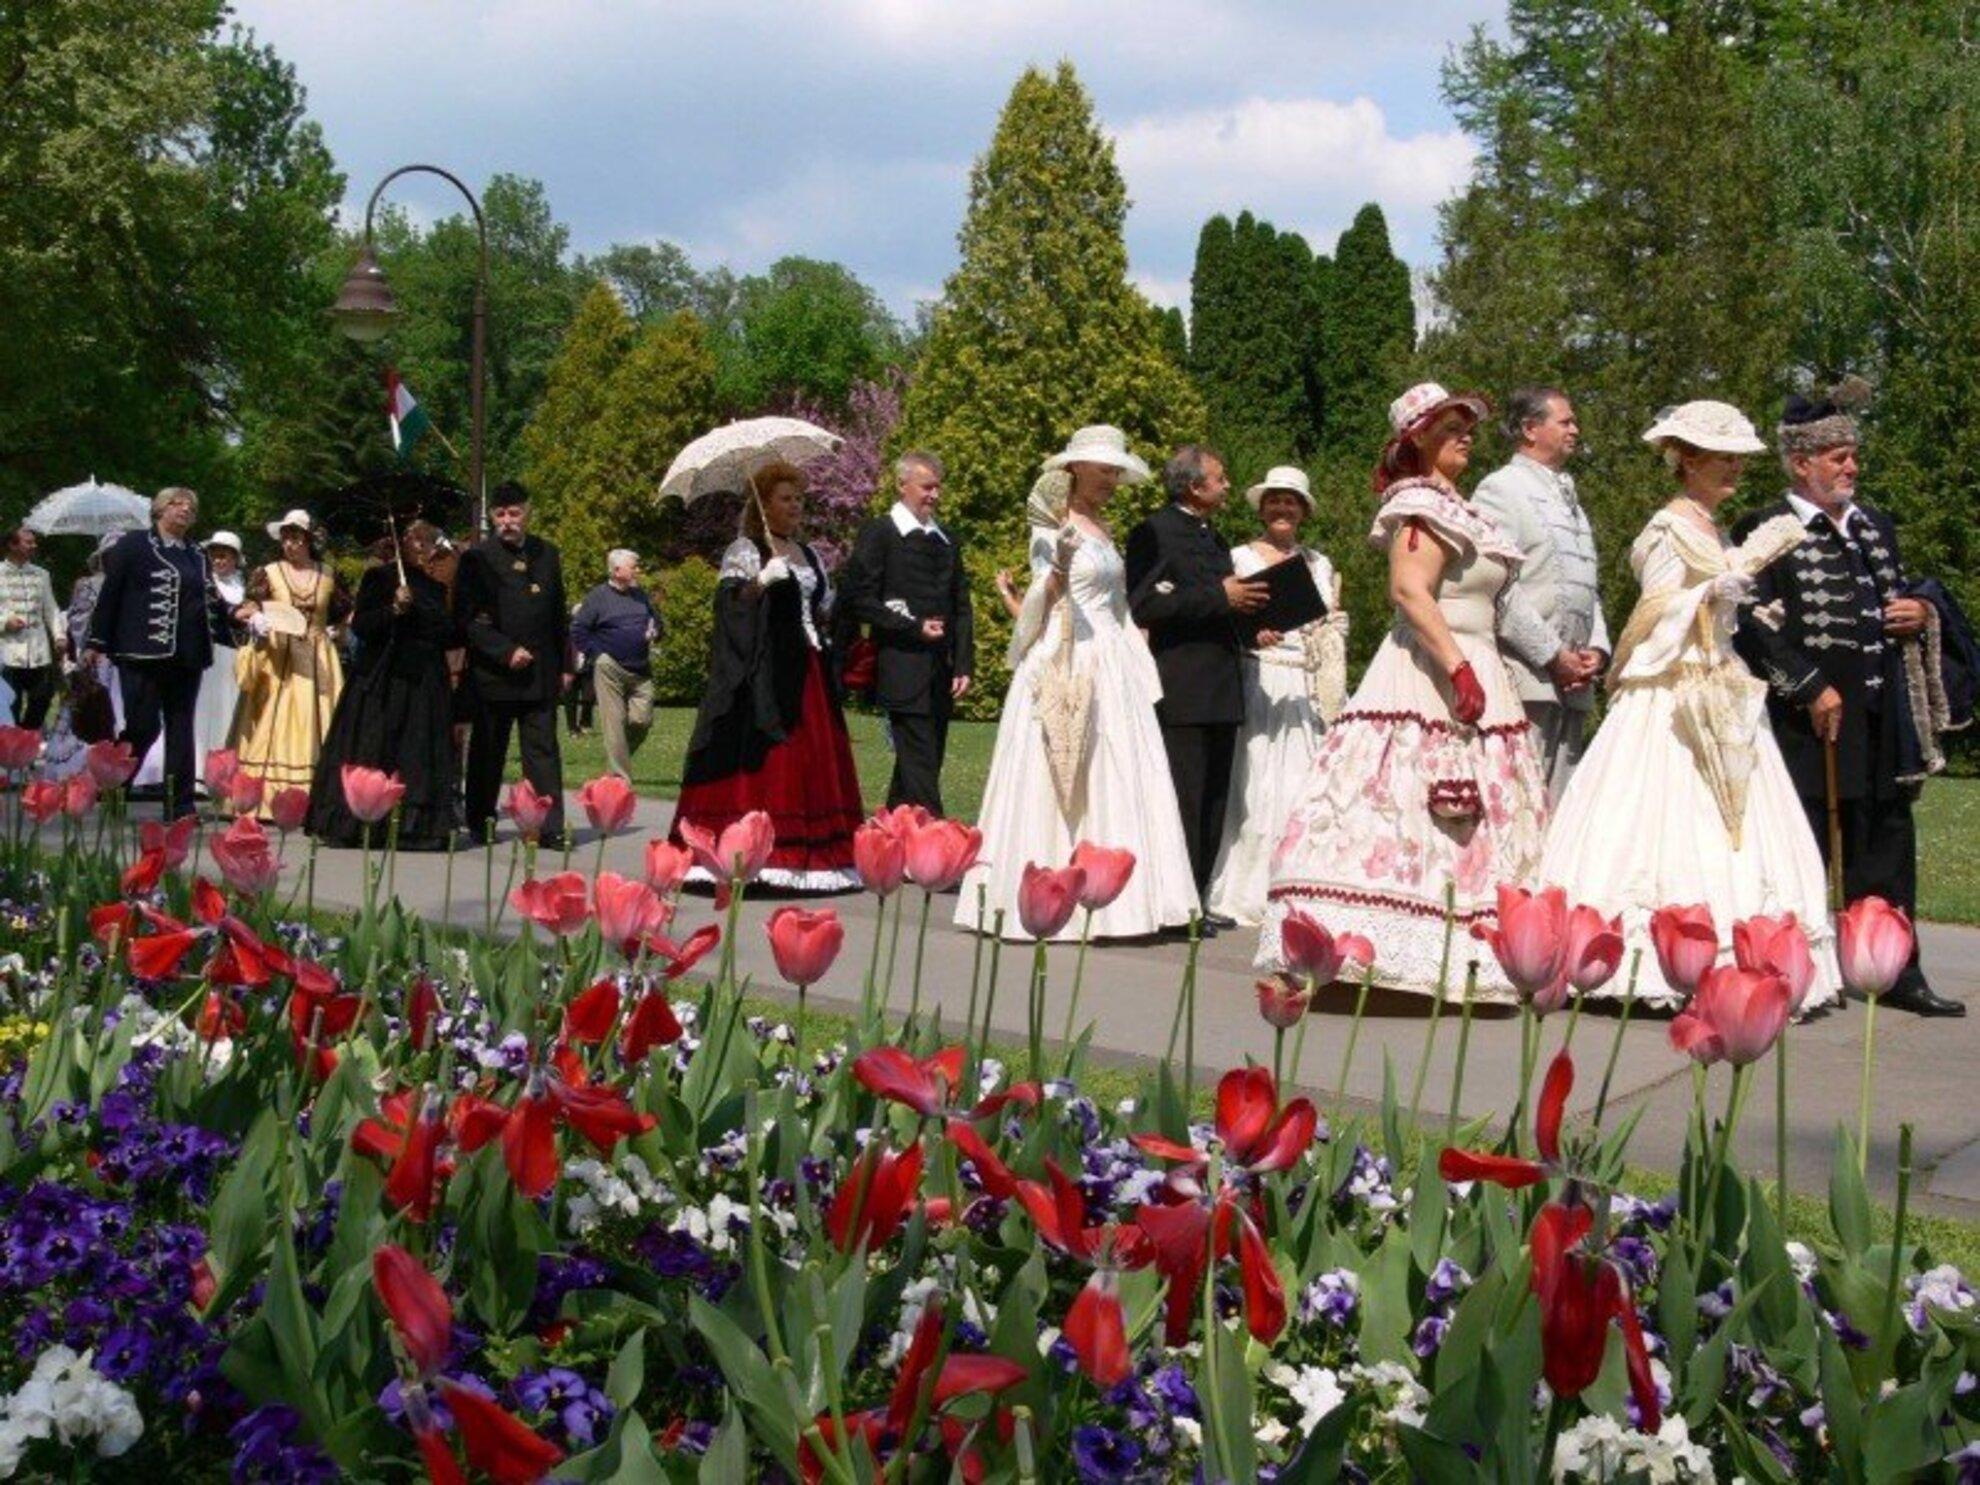 The Romantic 19th Century Festival